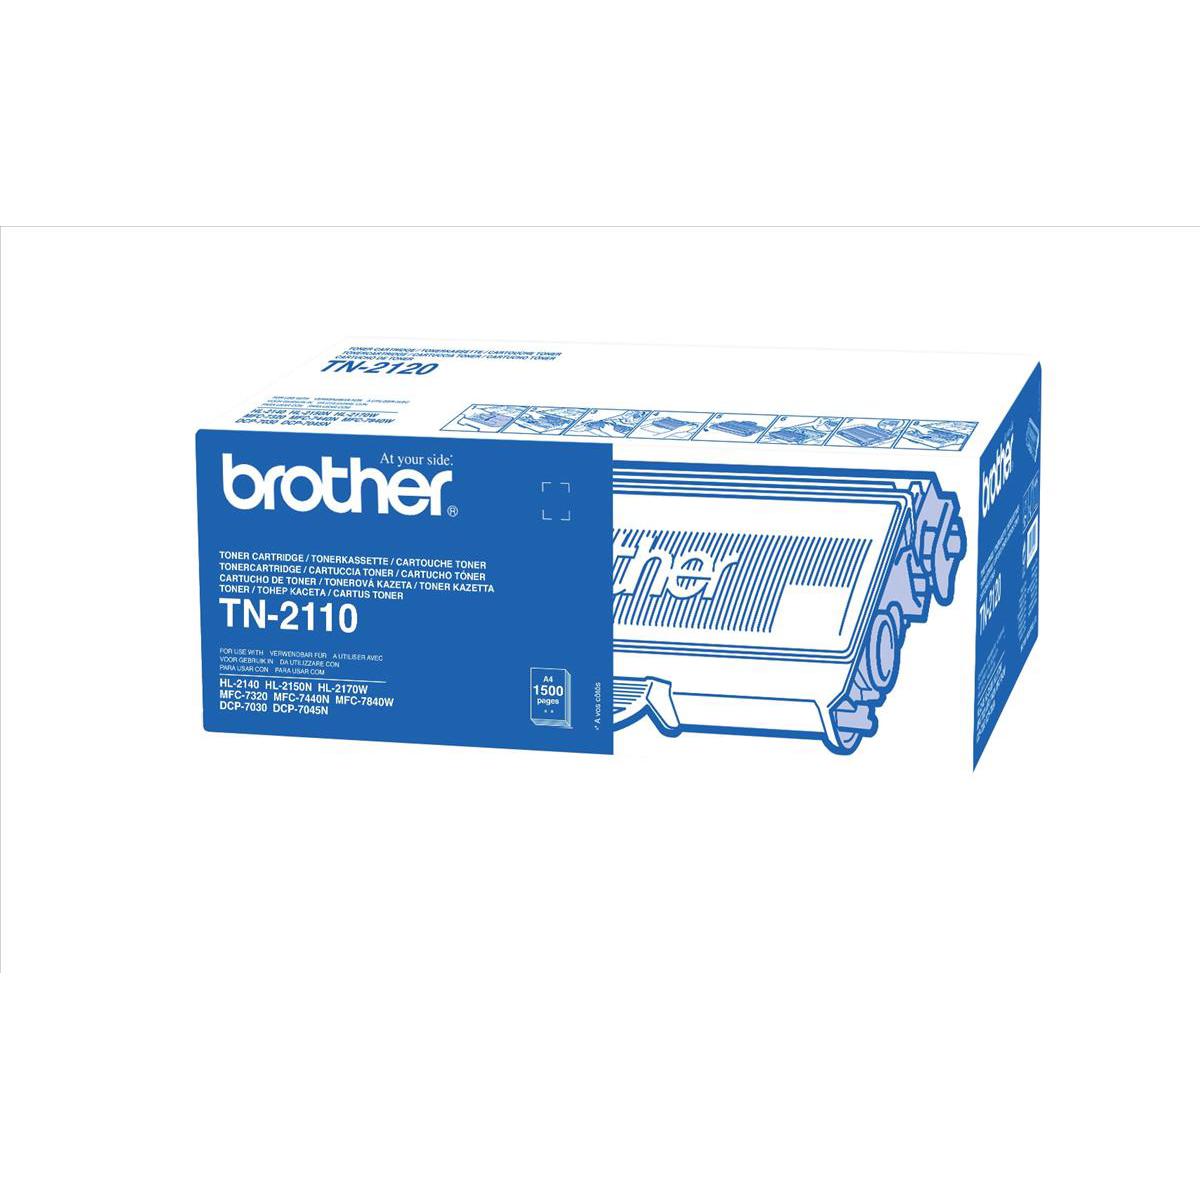 Brother Laser Toner Cartridge Page Life 1500pp Black Ref TN2110